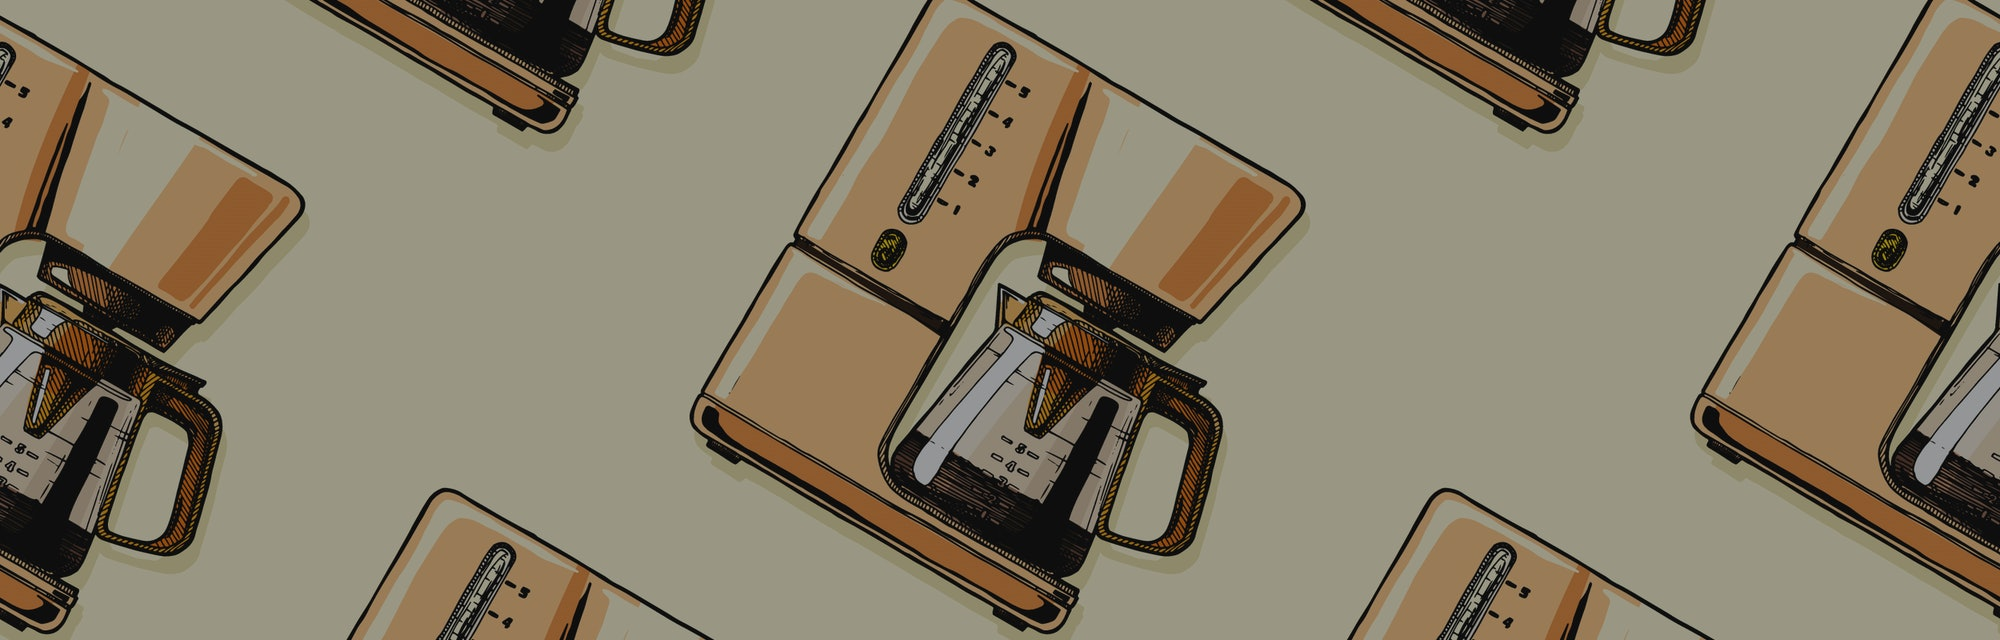 Seamless pattern with coffee machines. Single-cup maker, drip coffeemaker, percolator and espresso machine.